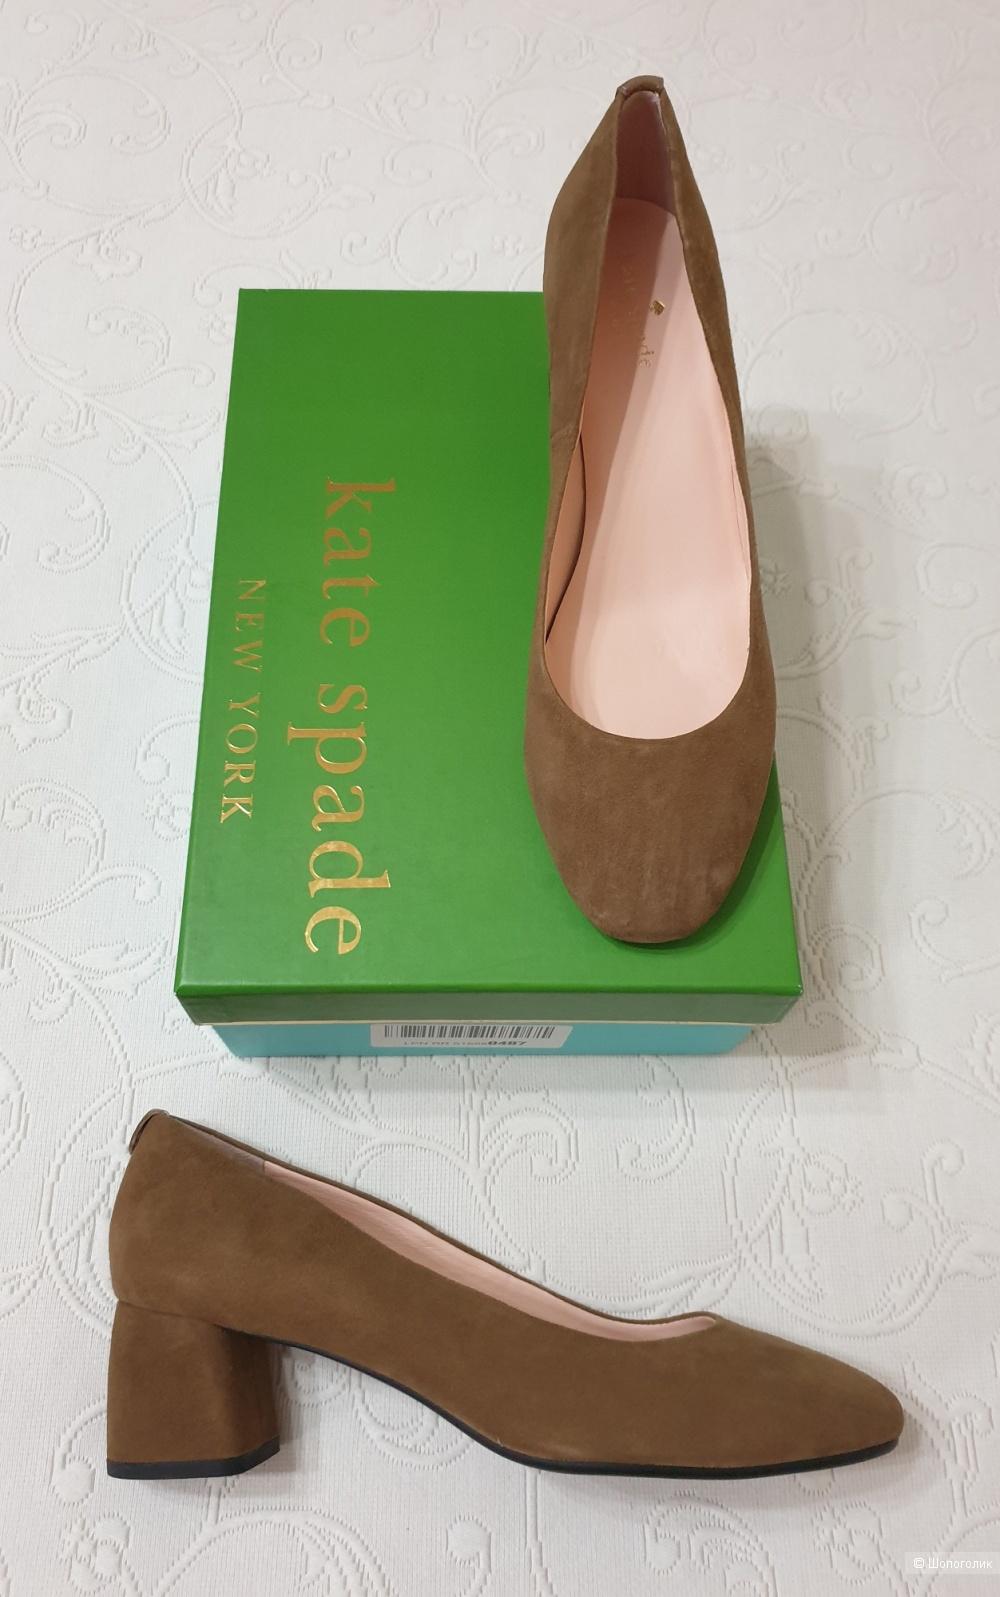 Туфли Kate Spade р. 9.5 US (на 40.5 рос.)